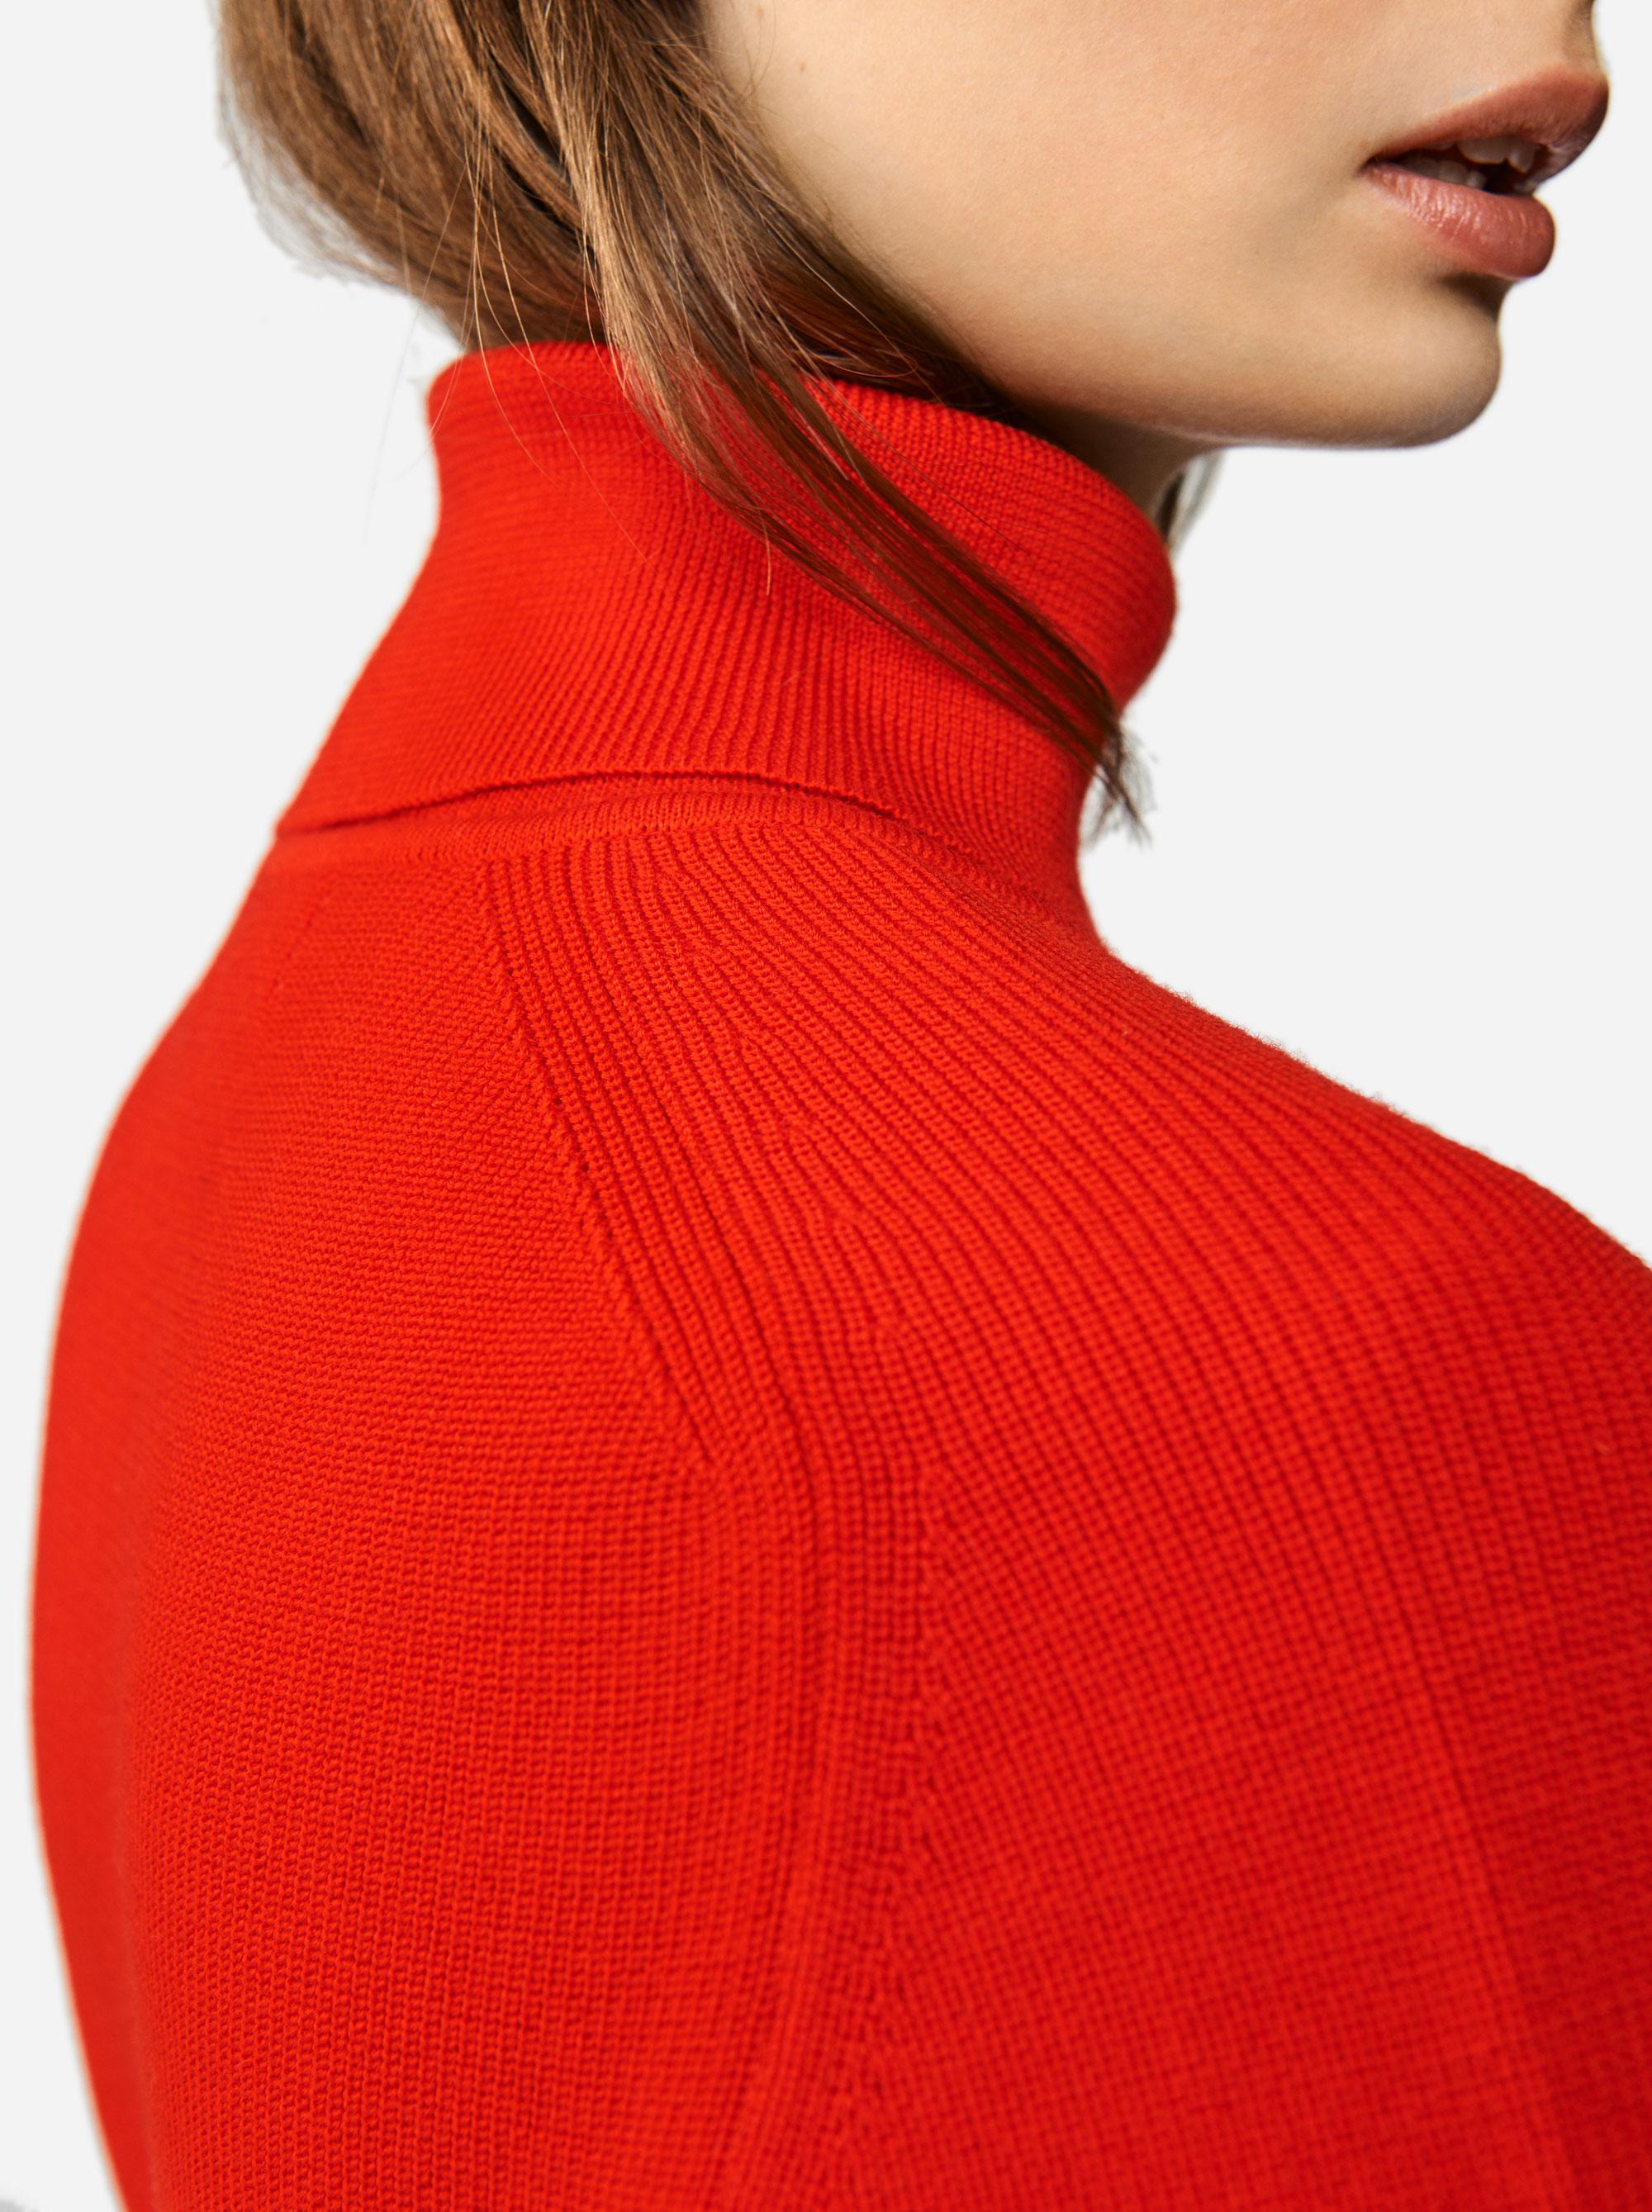 Teym - Turtleneck - The Merino Sweater - Men - Red - 2